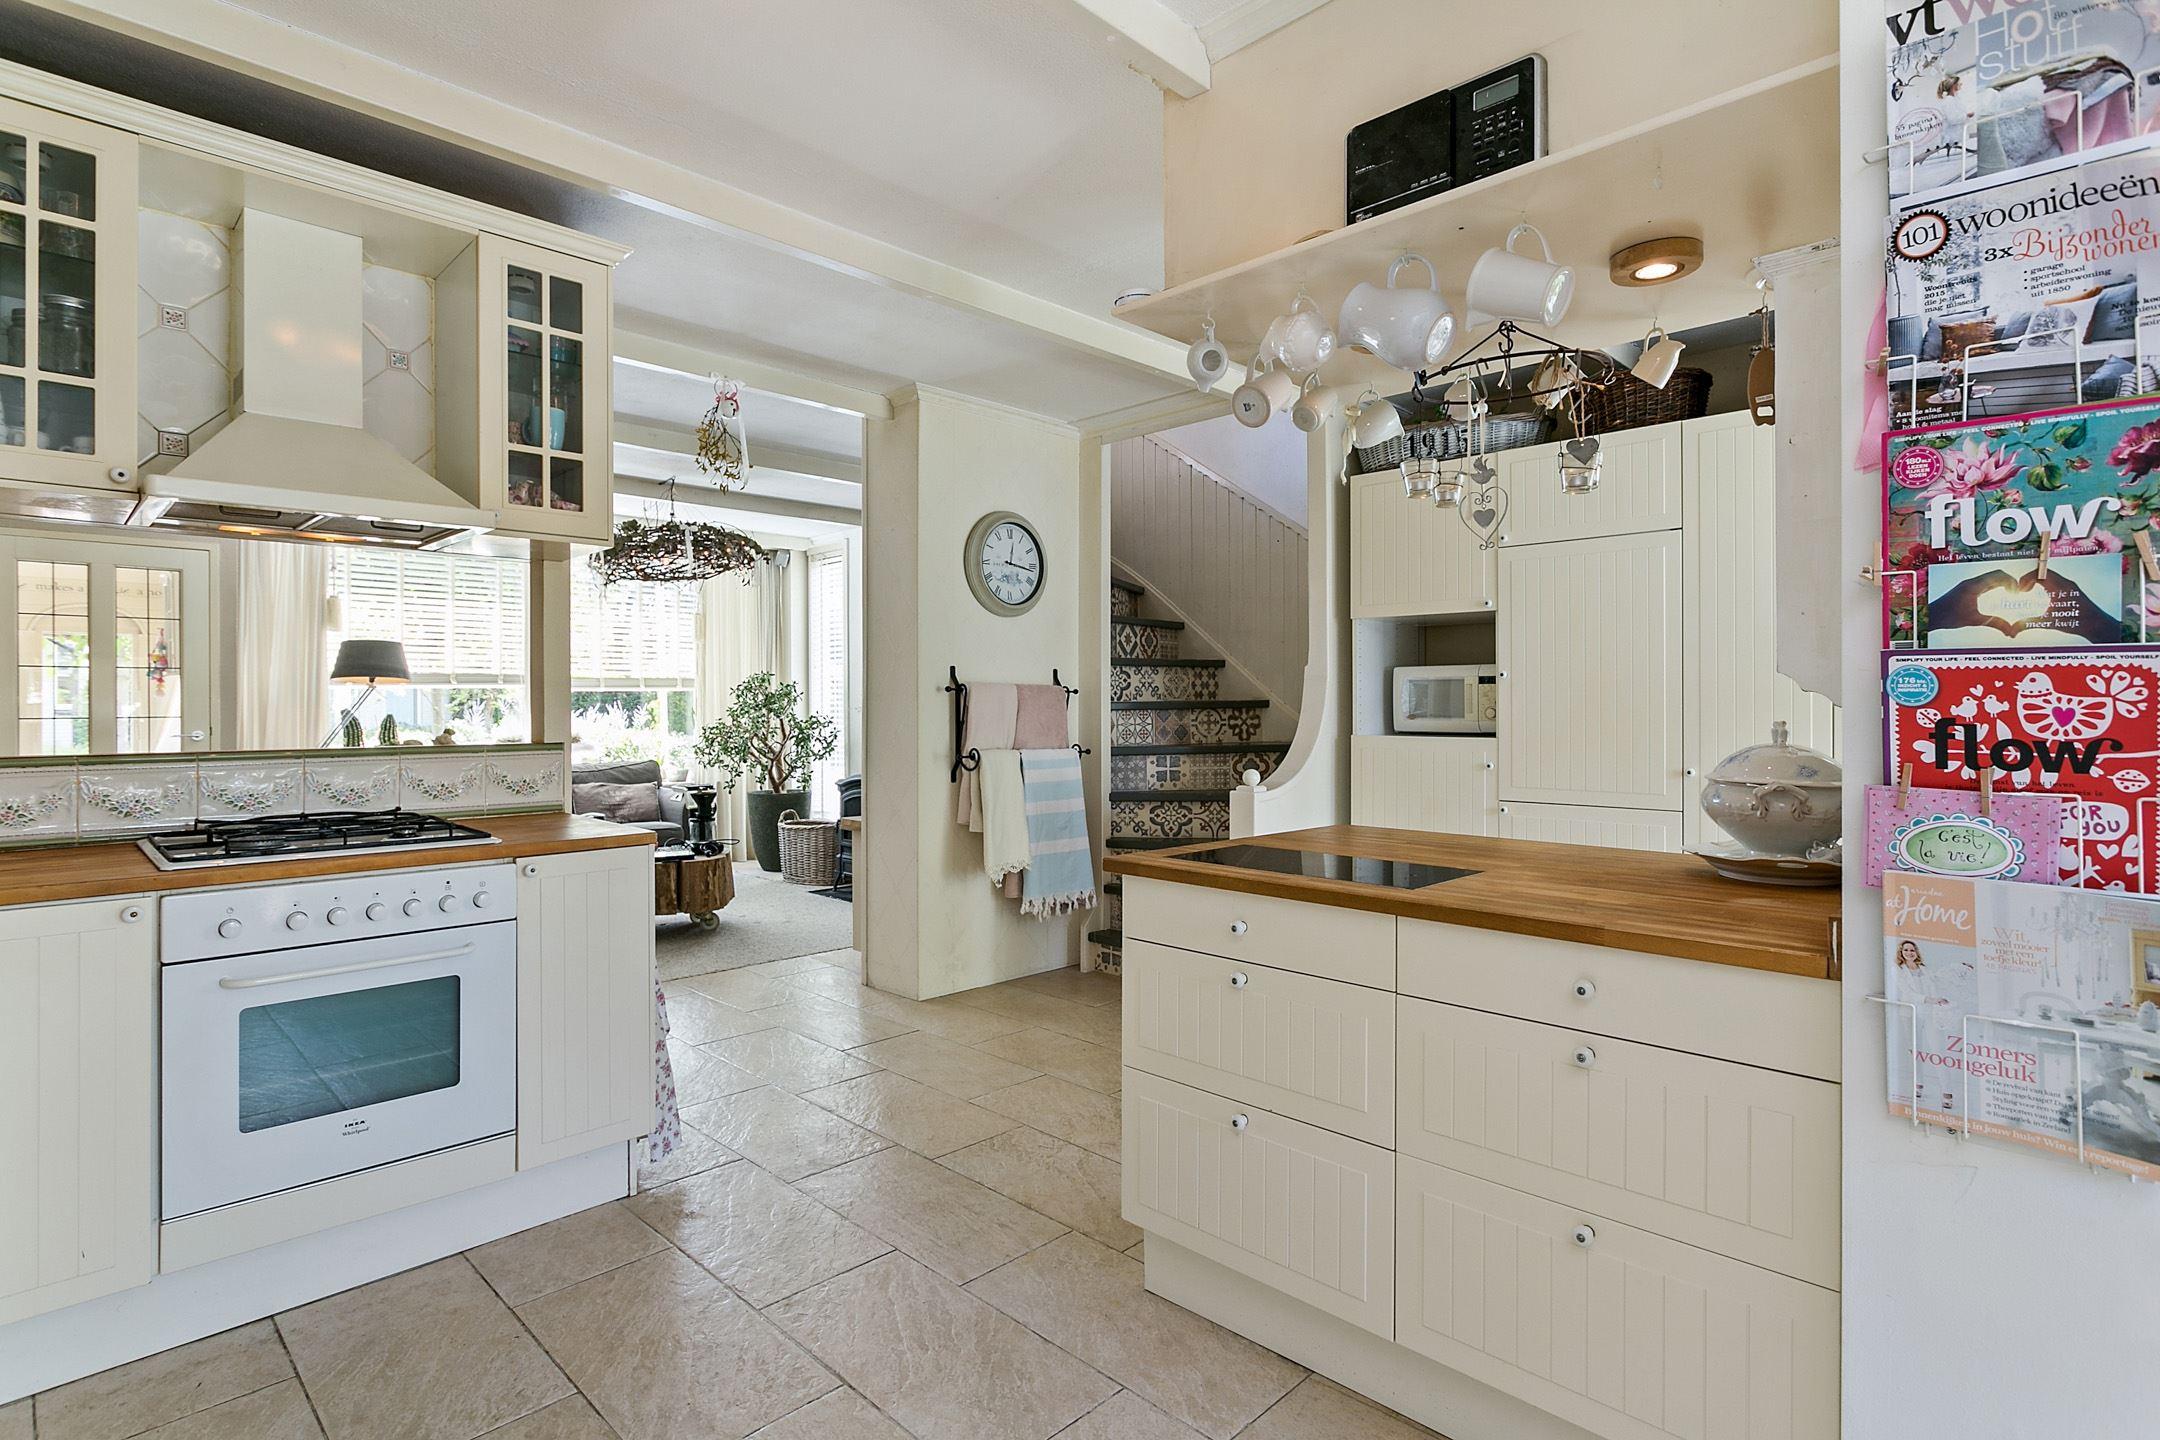 Keuken Design Emmeloord : Verkocht bunschotenlaan ew emmeloord funda